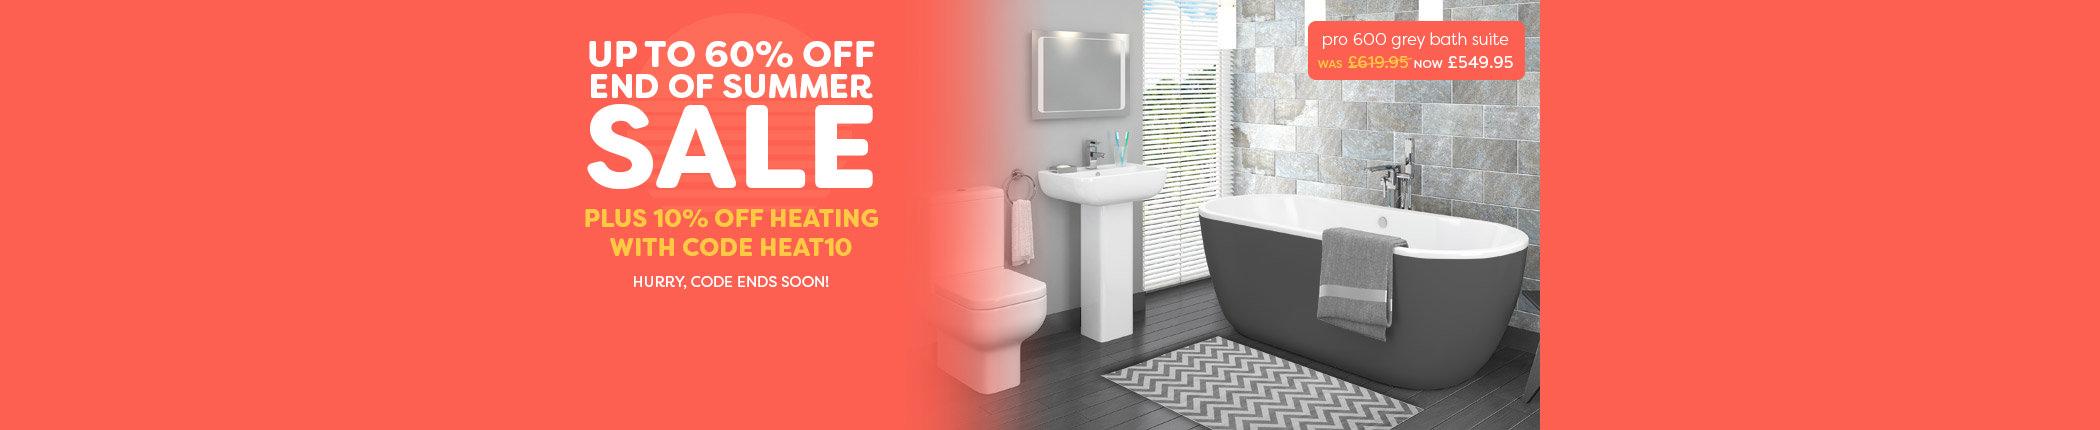 summer-sale-10off-heating-pro-600-grey-bath-suite-countdown-sep17-hbnr